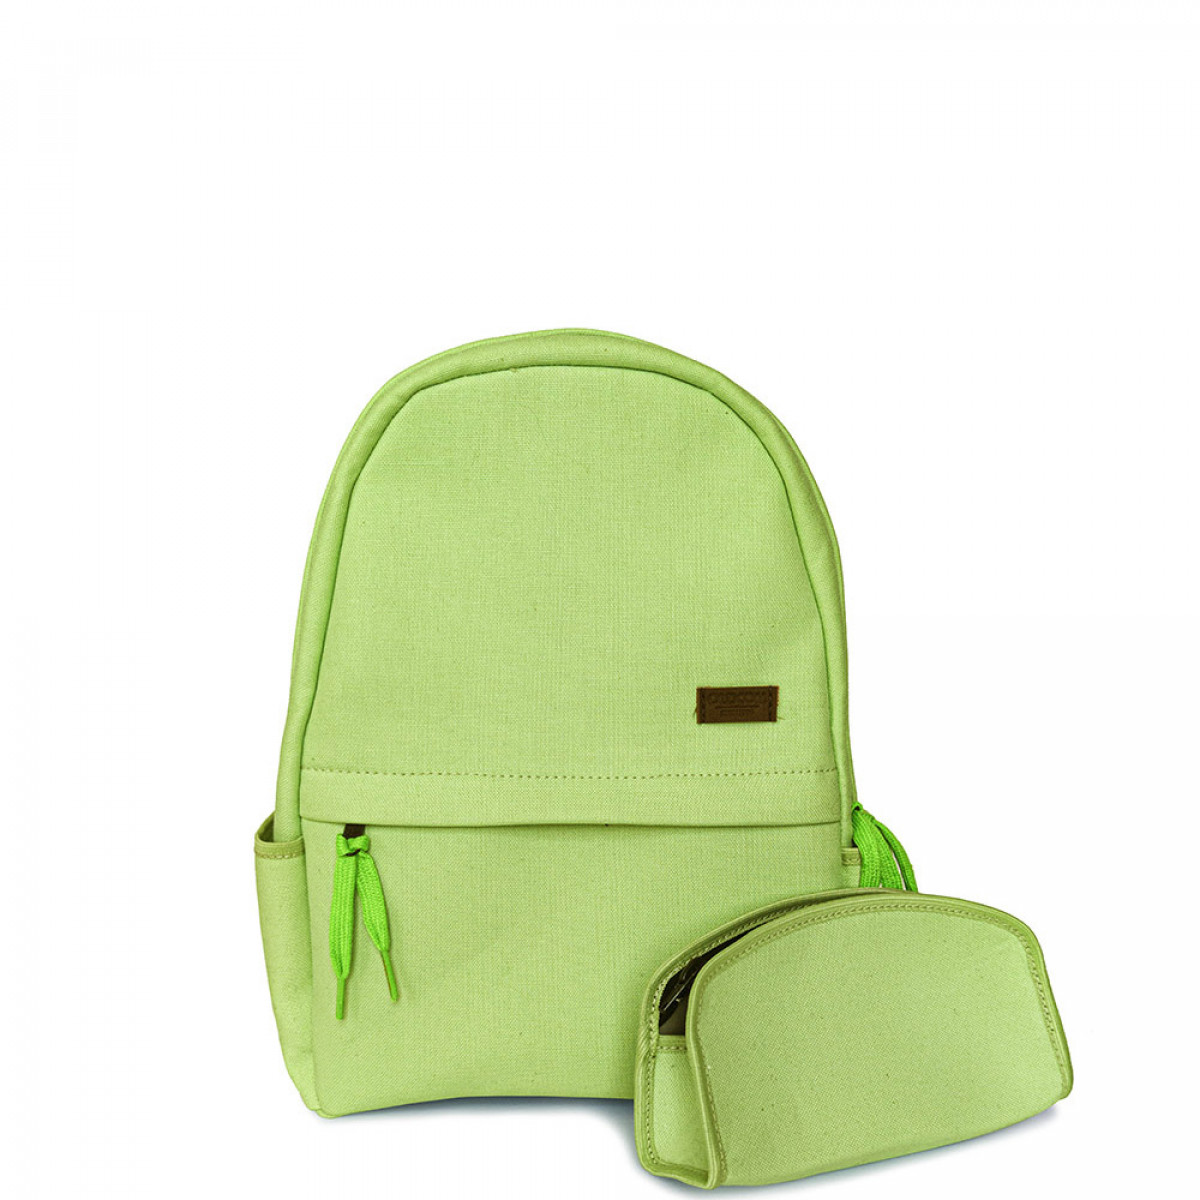 Backpack MINI, Pistachio